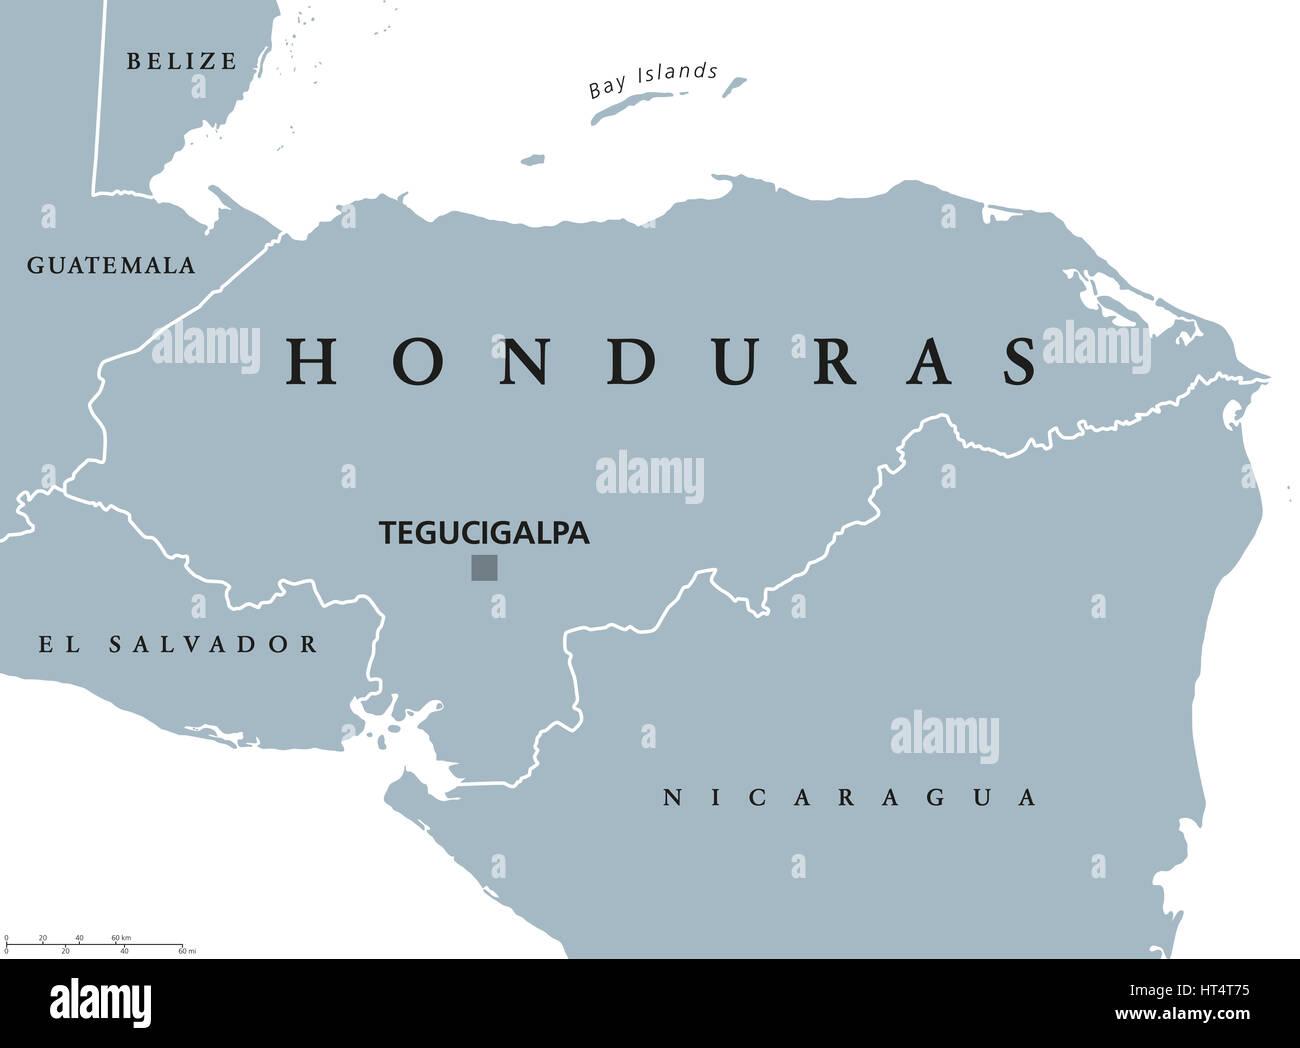 Honduras political map with capital Tegucigalpa national borders